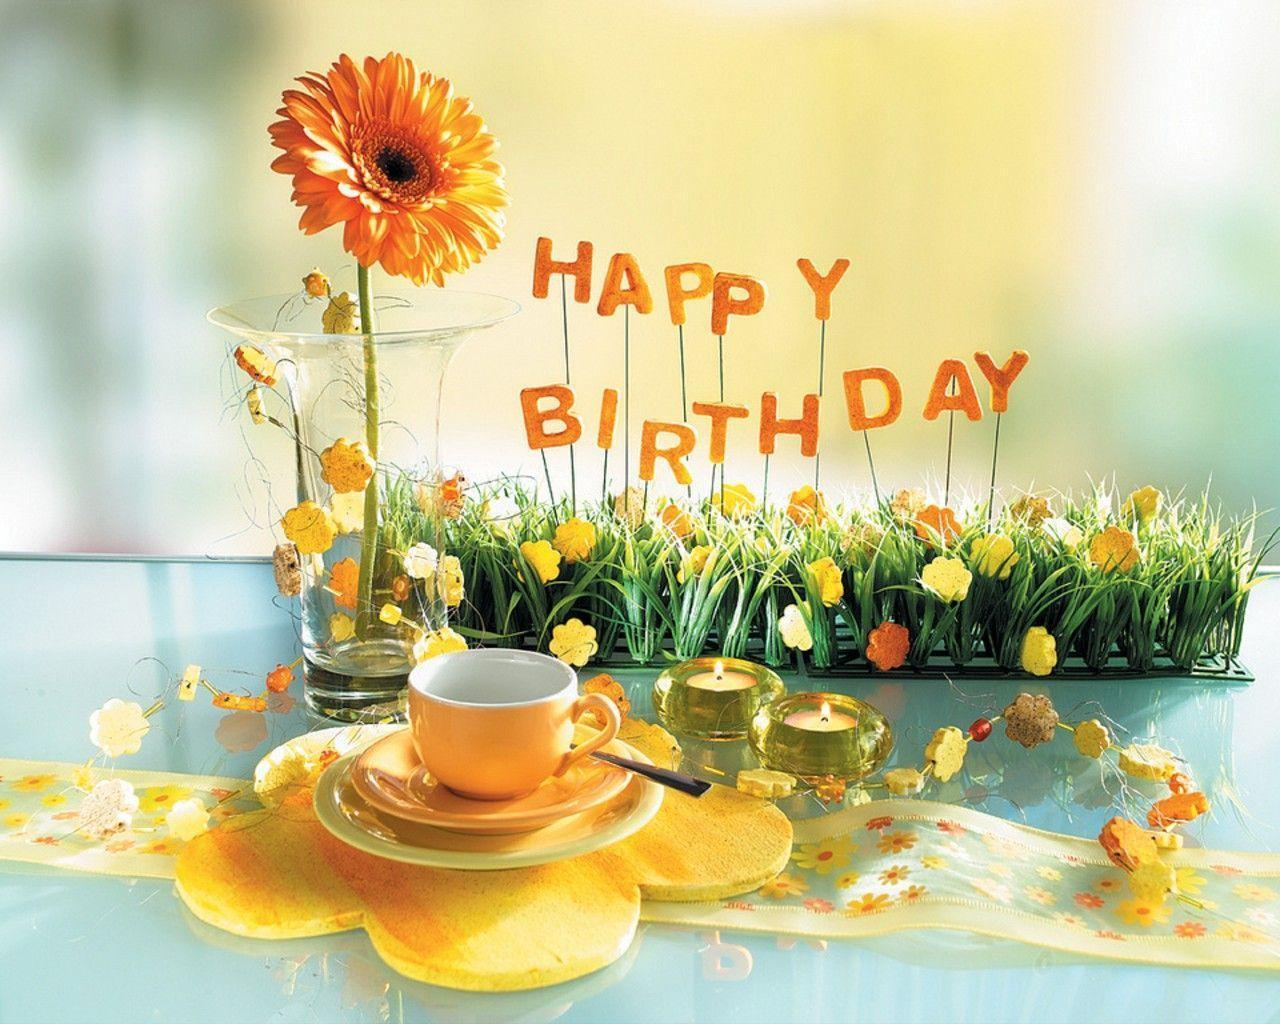 Happy Birthday Wallpapers | Mastimasaala.